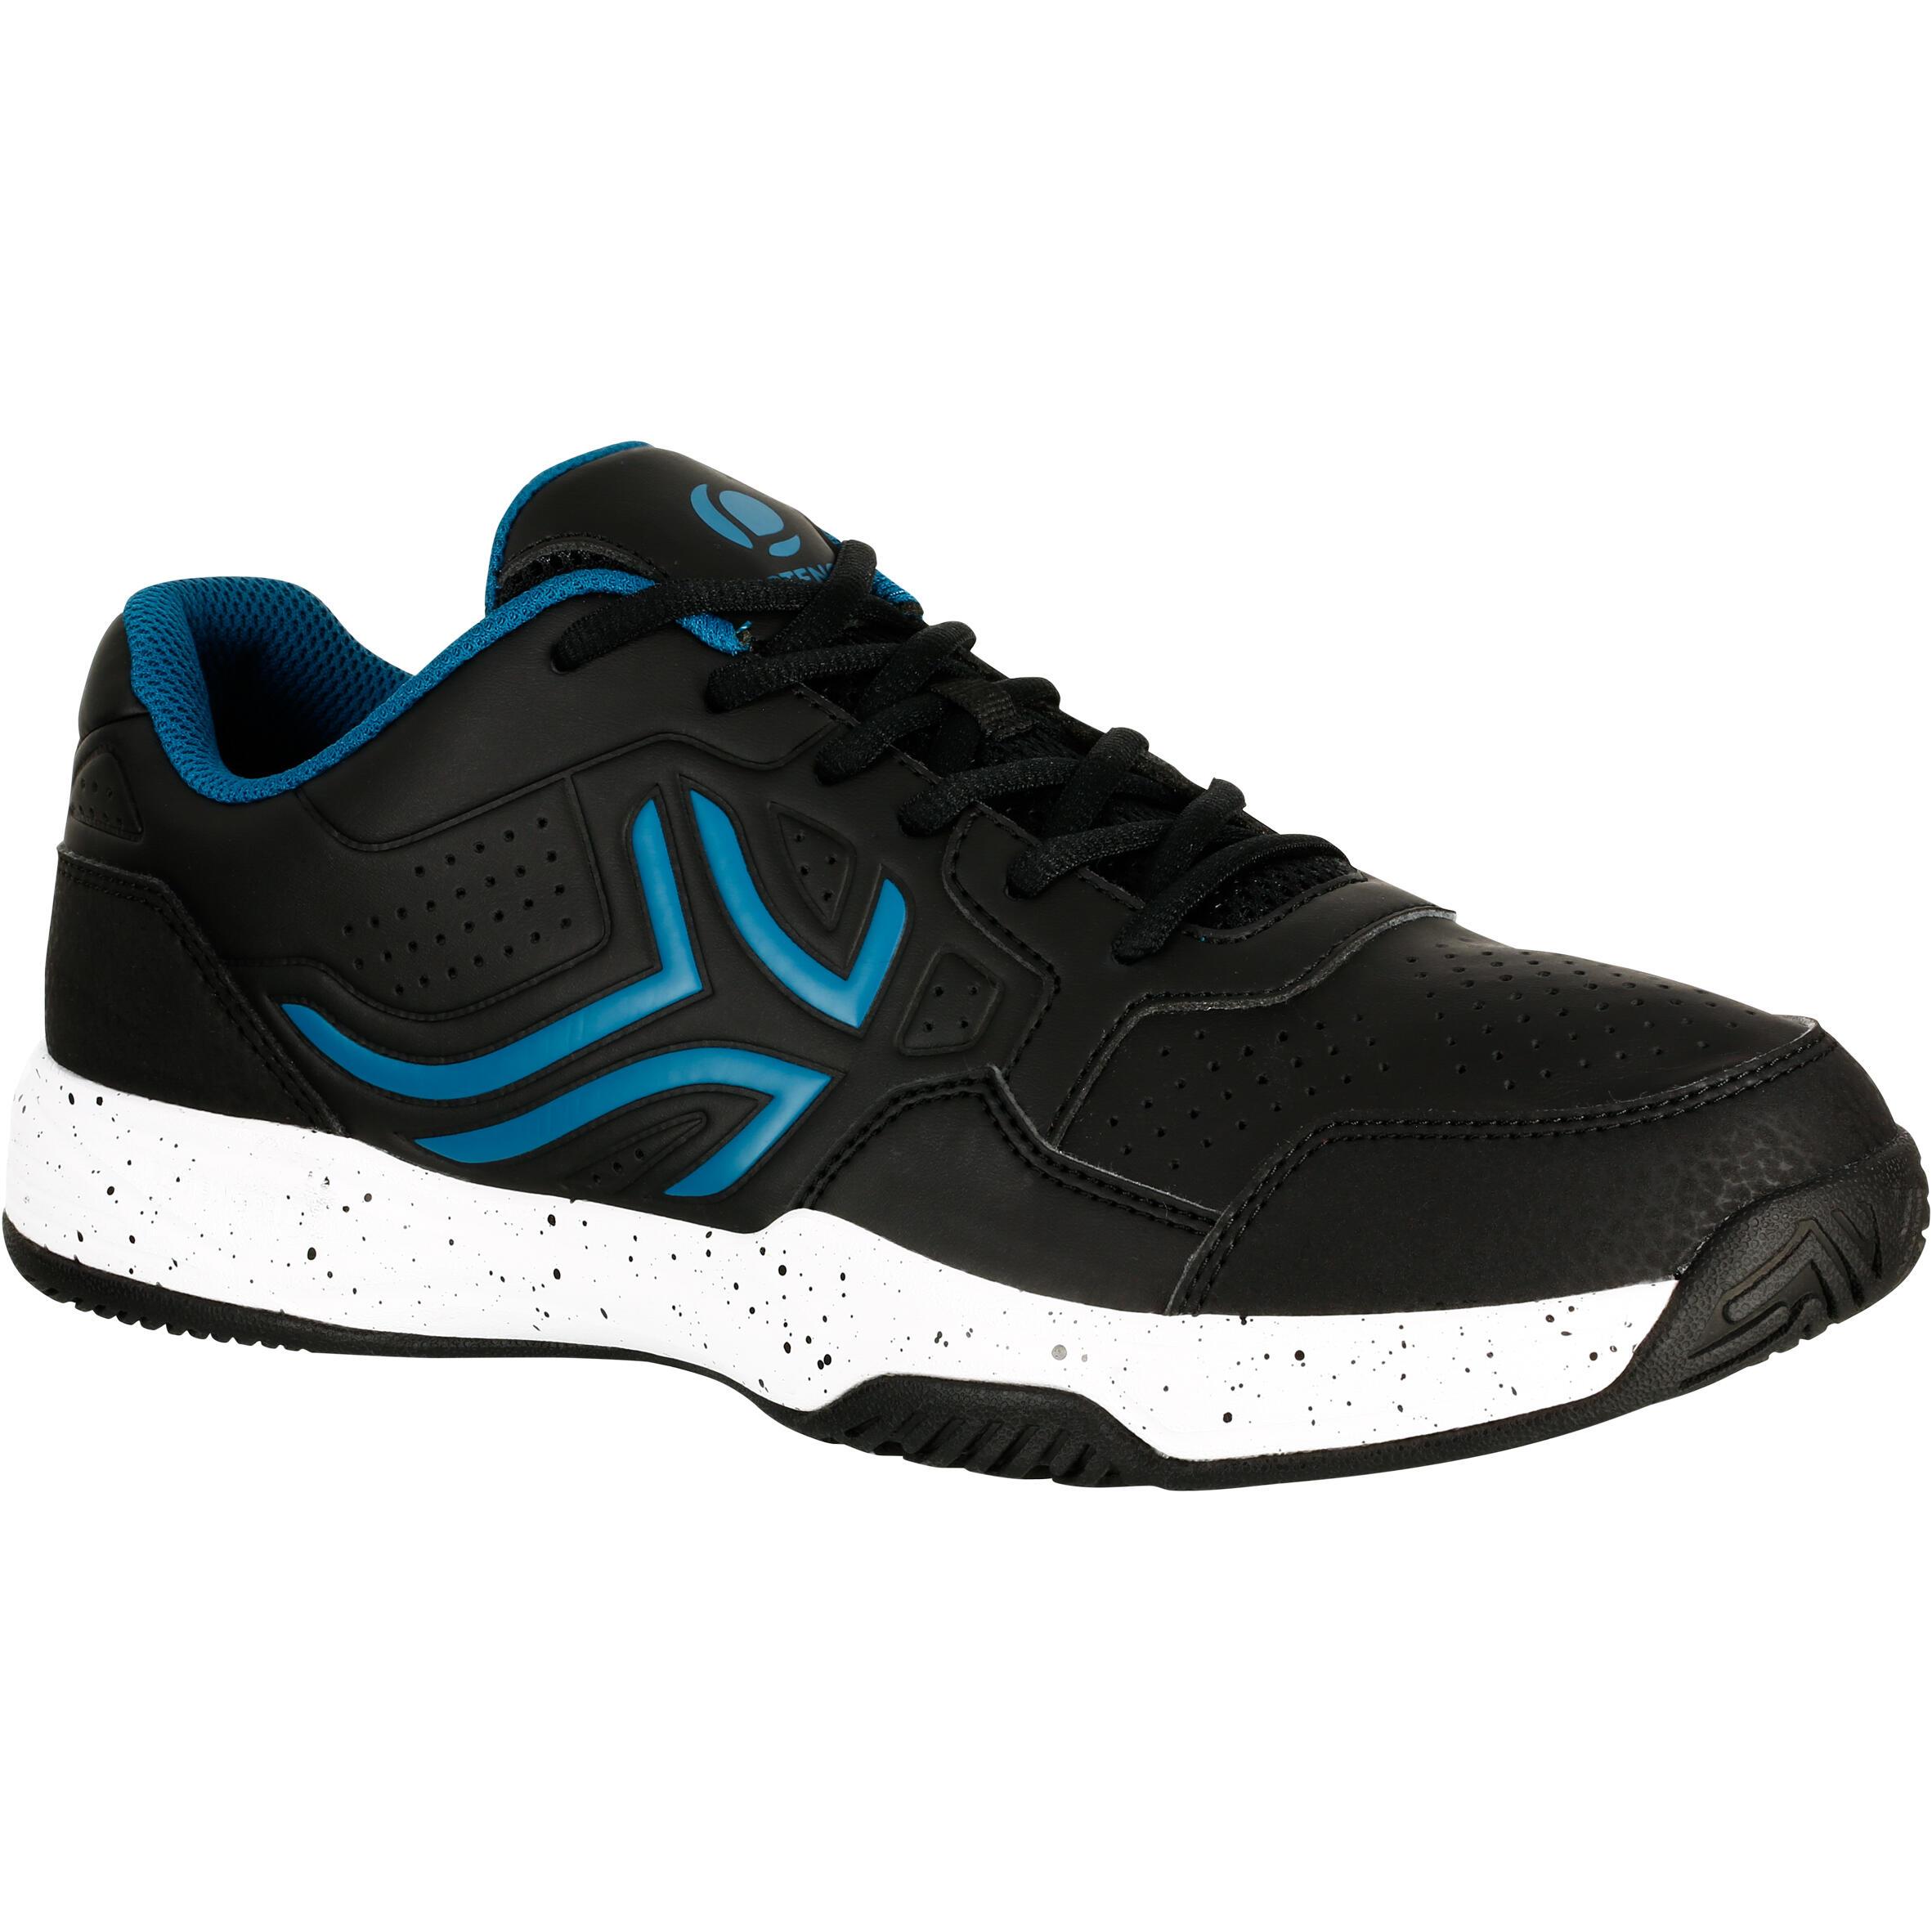 Calzado de tenis TS190 Man BLACK